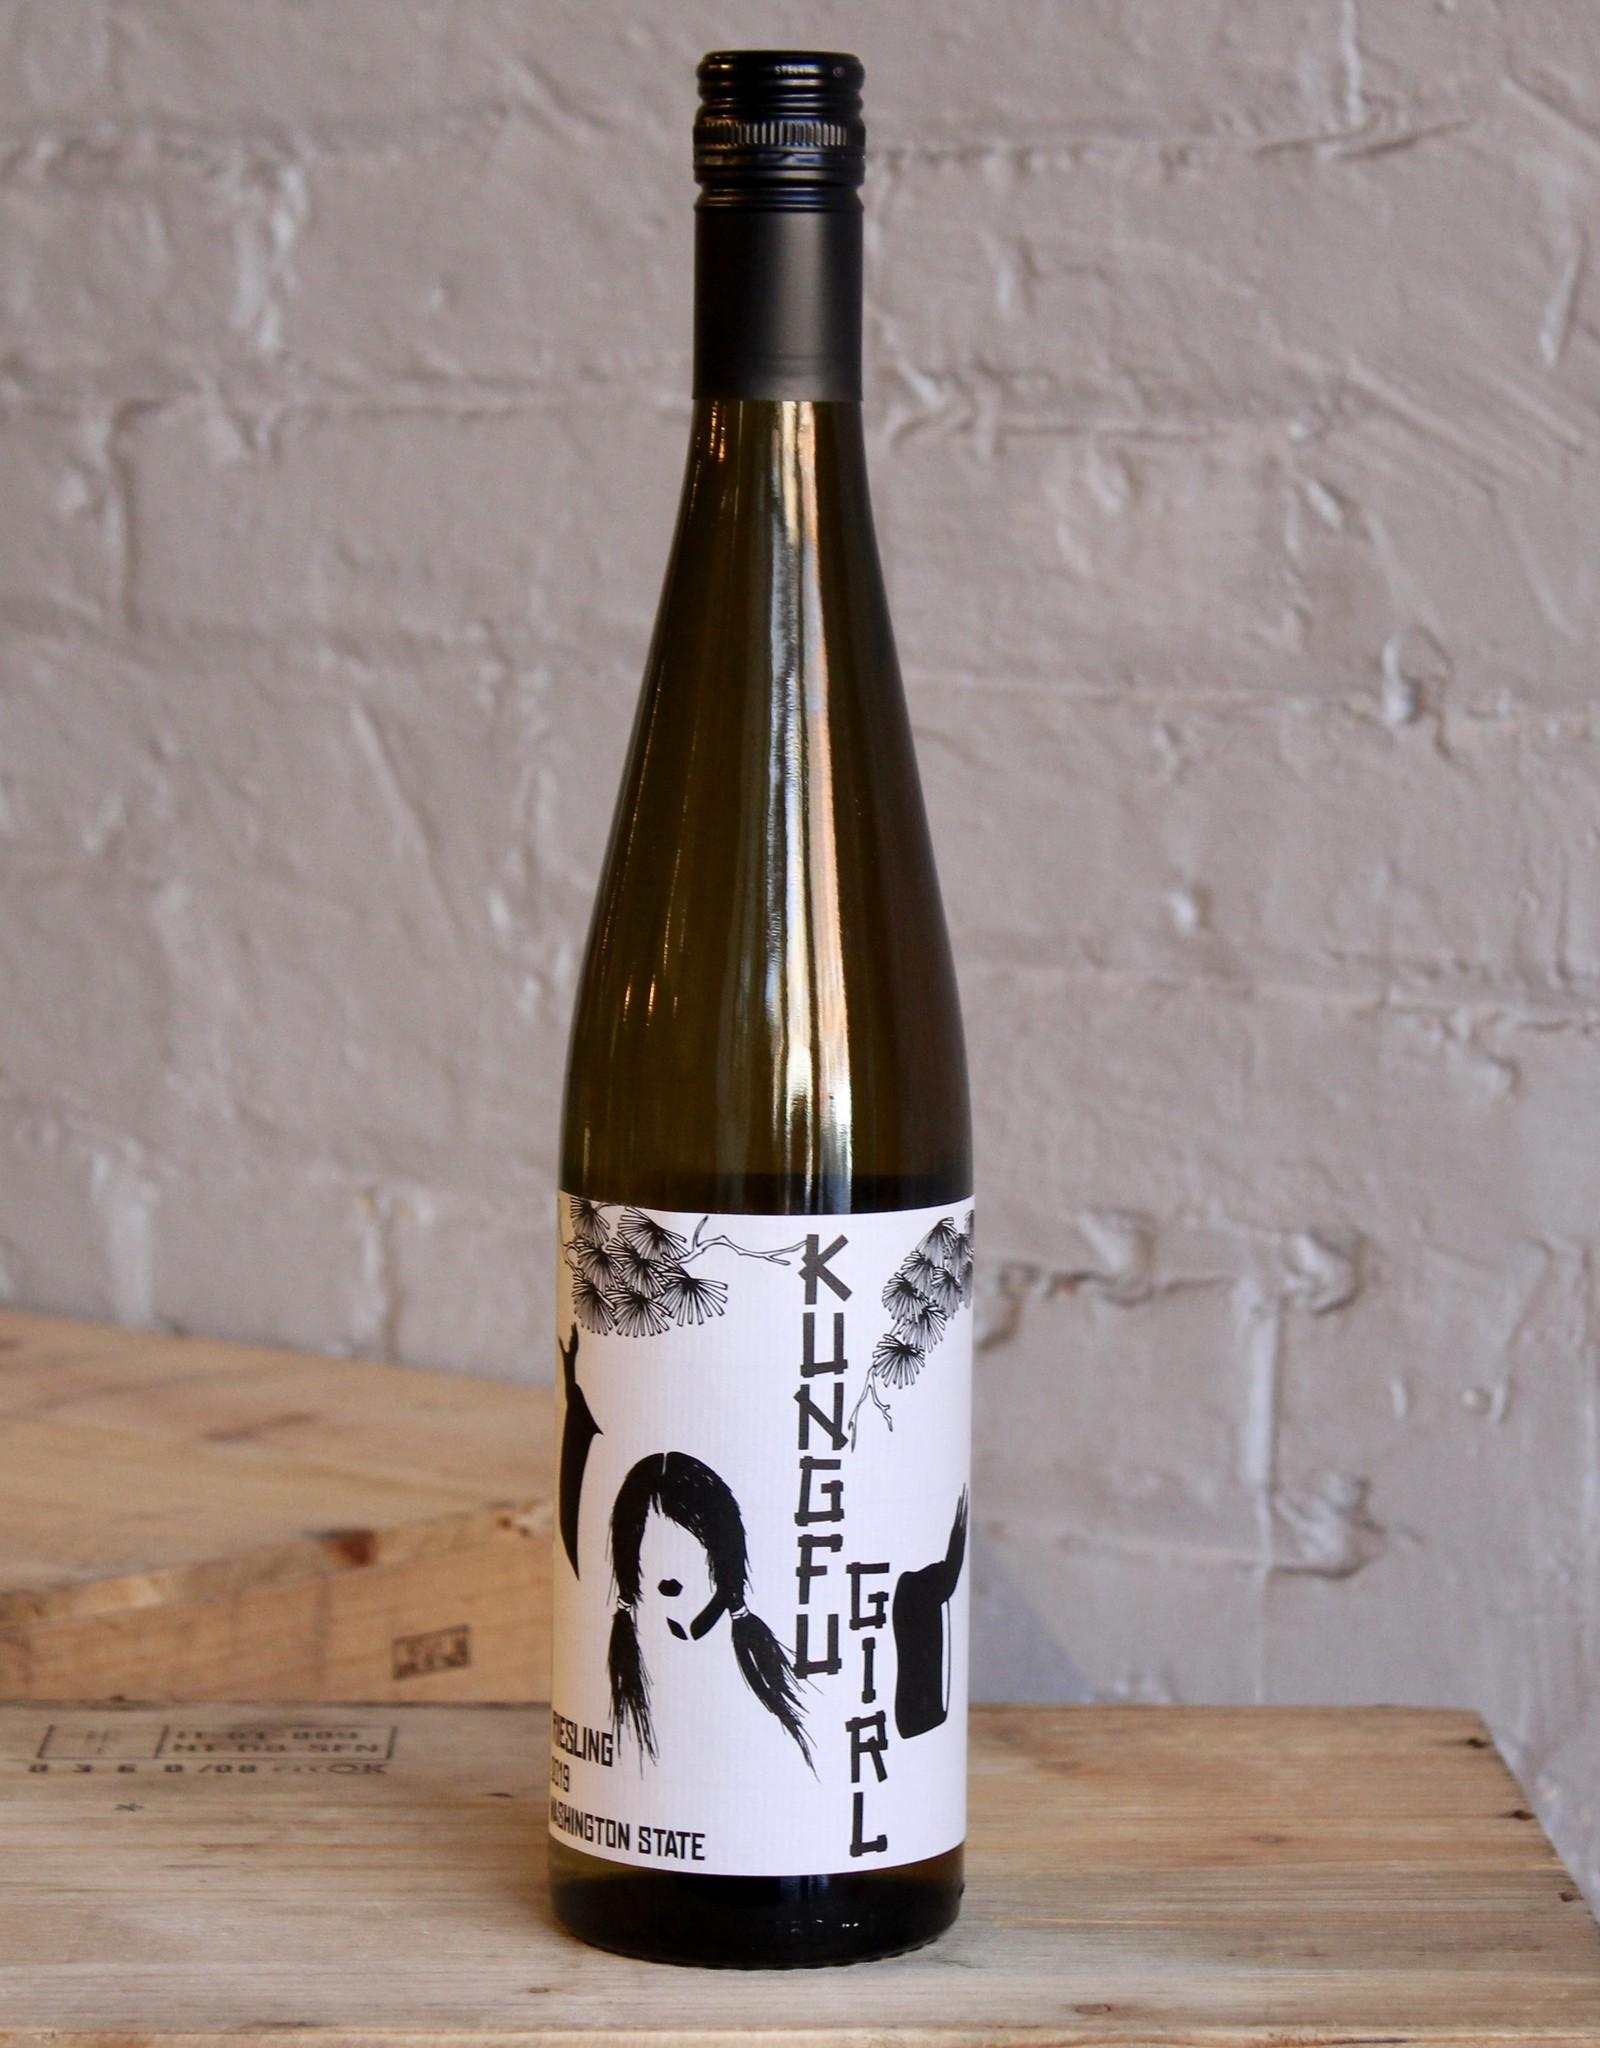 Wine 2019 Charles Smith Wines Kung Fu Girl Riesling - Columbia Valley, WA (750ml)